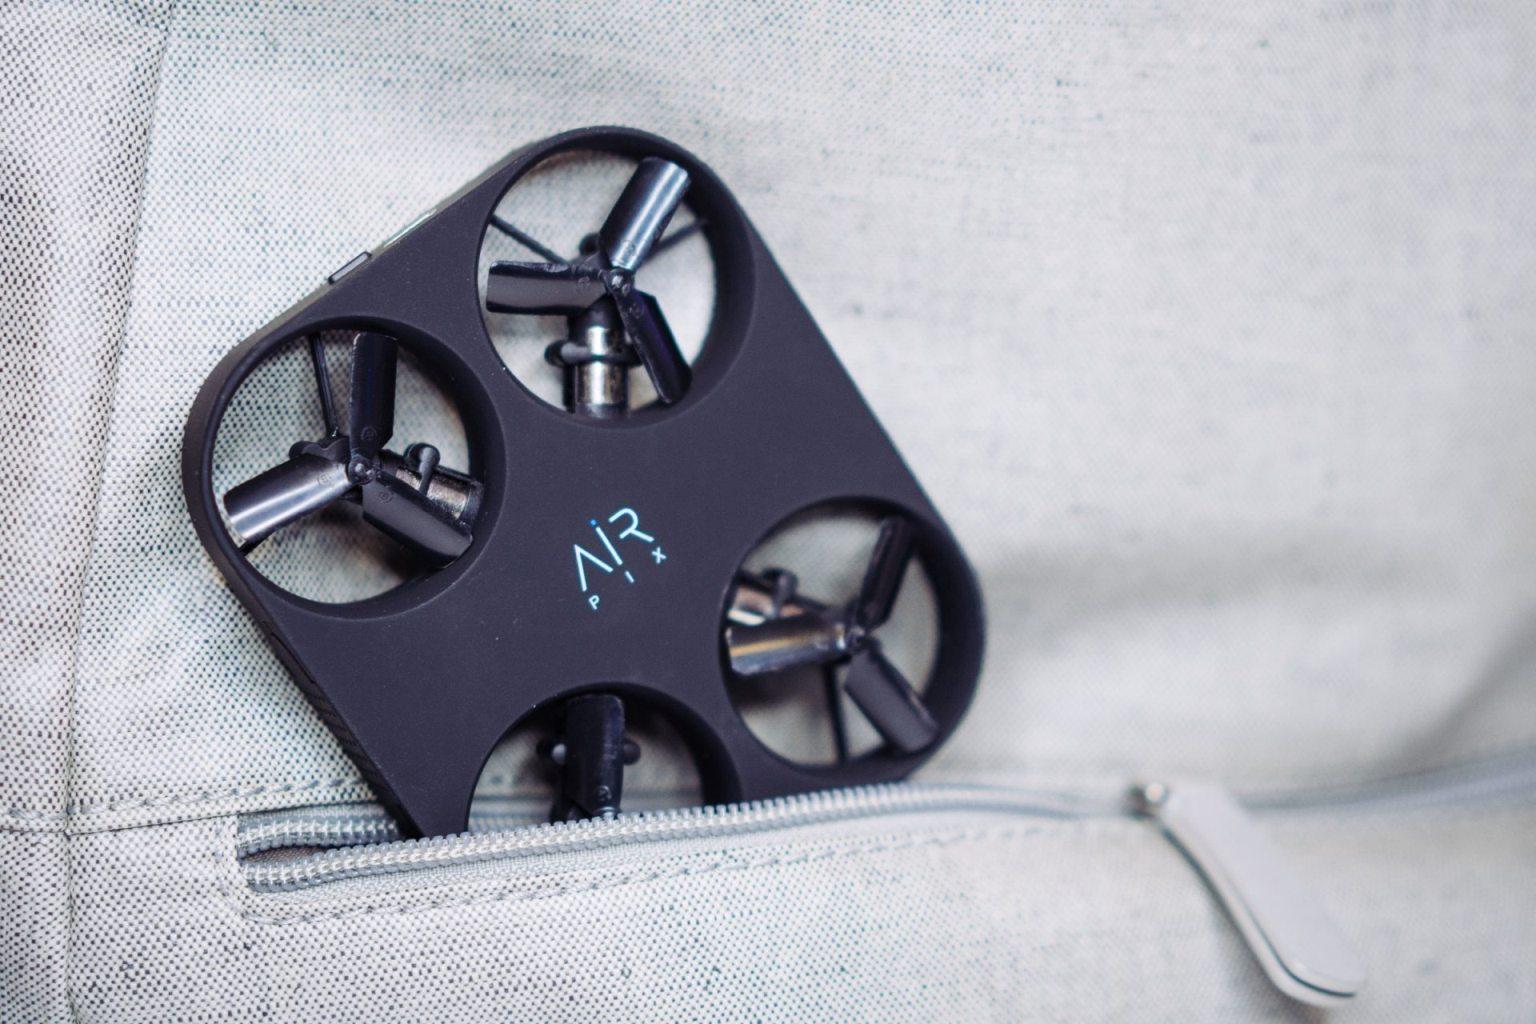 AirPix in bag